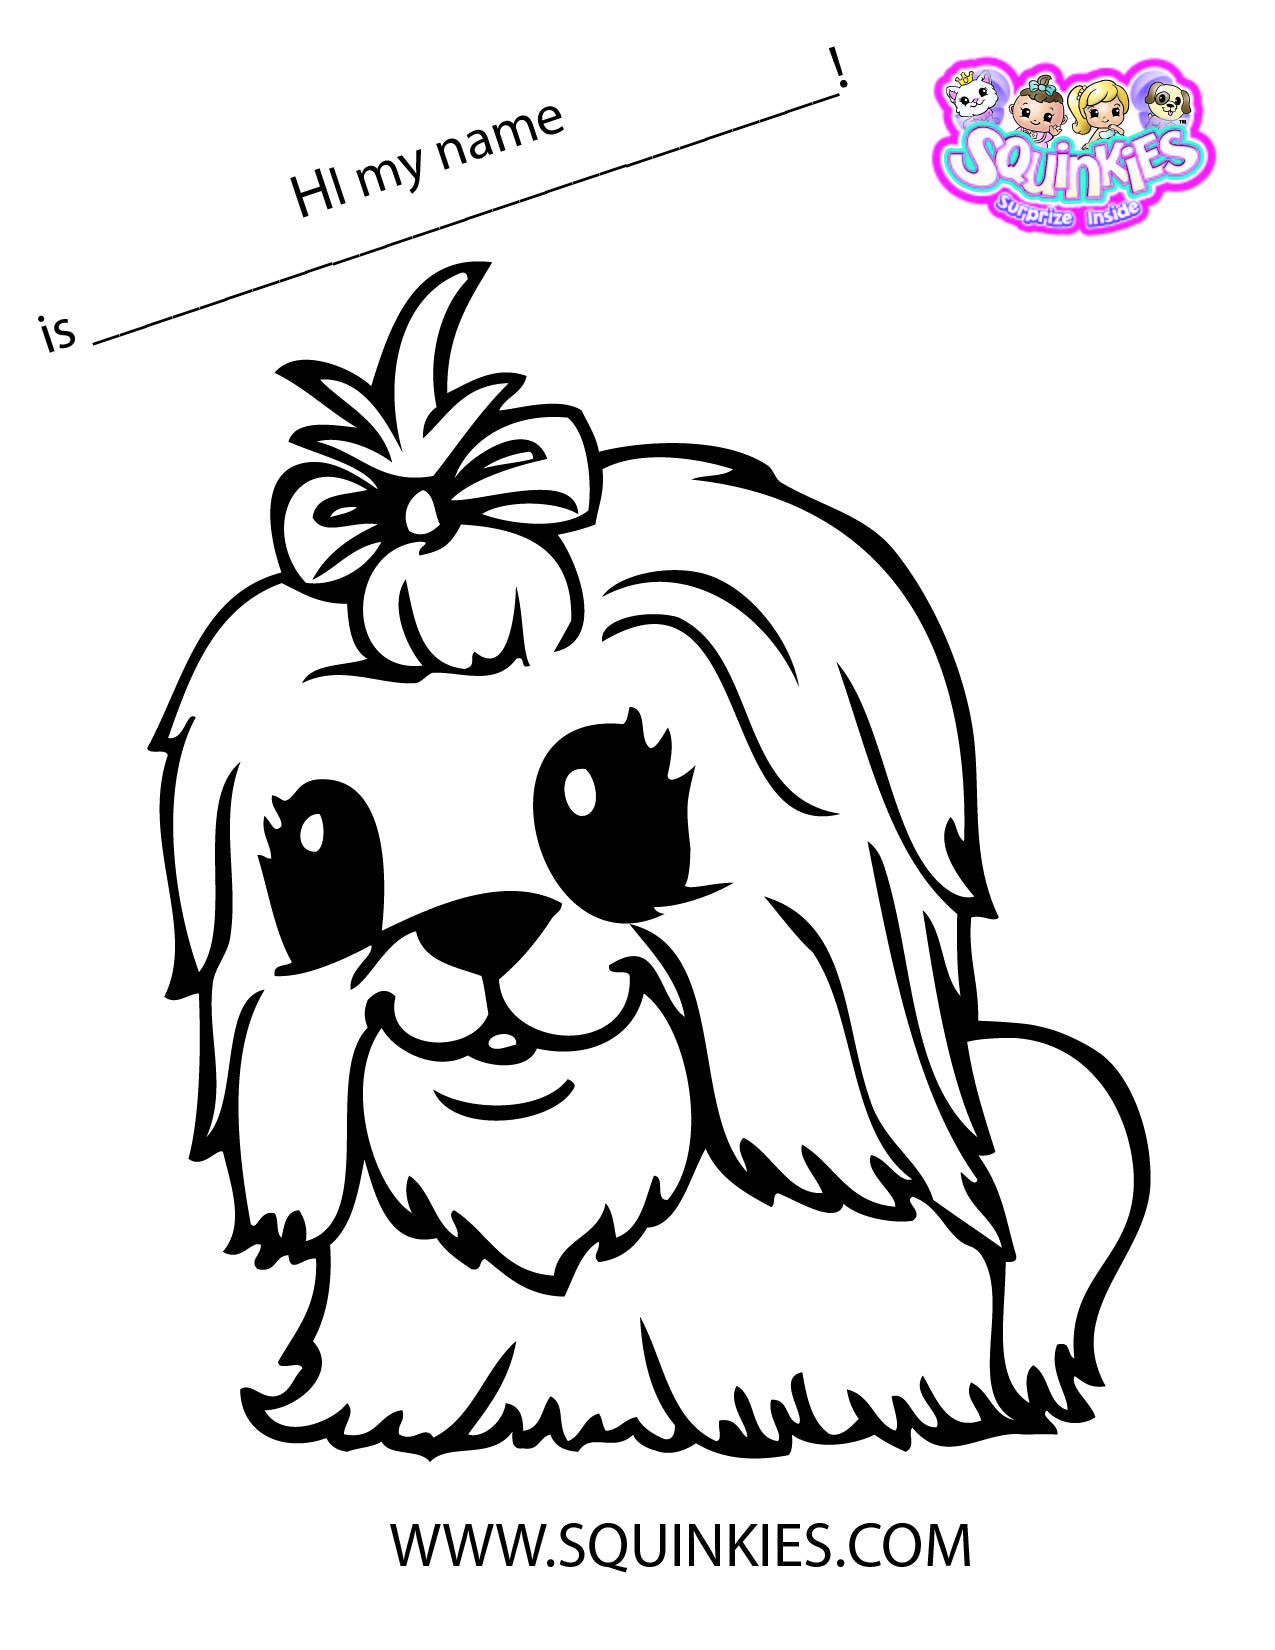 1275x1650 Squinkies Coloring Page! Squinkies Activities Craft